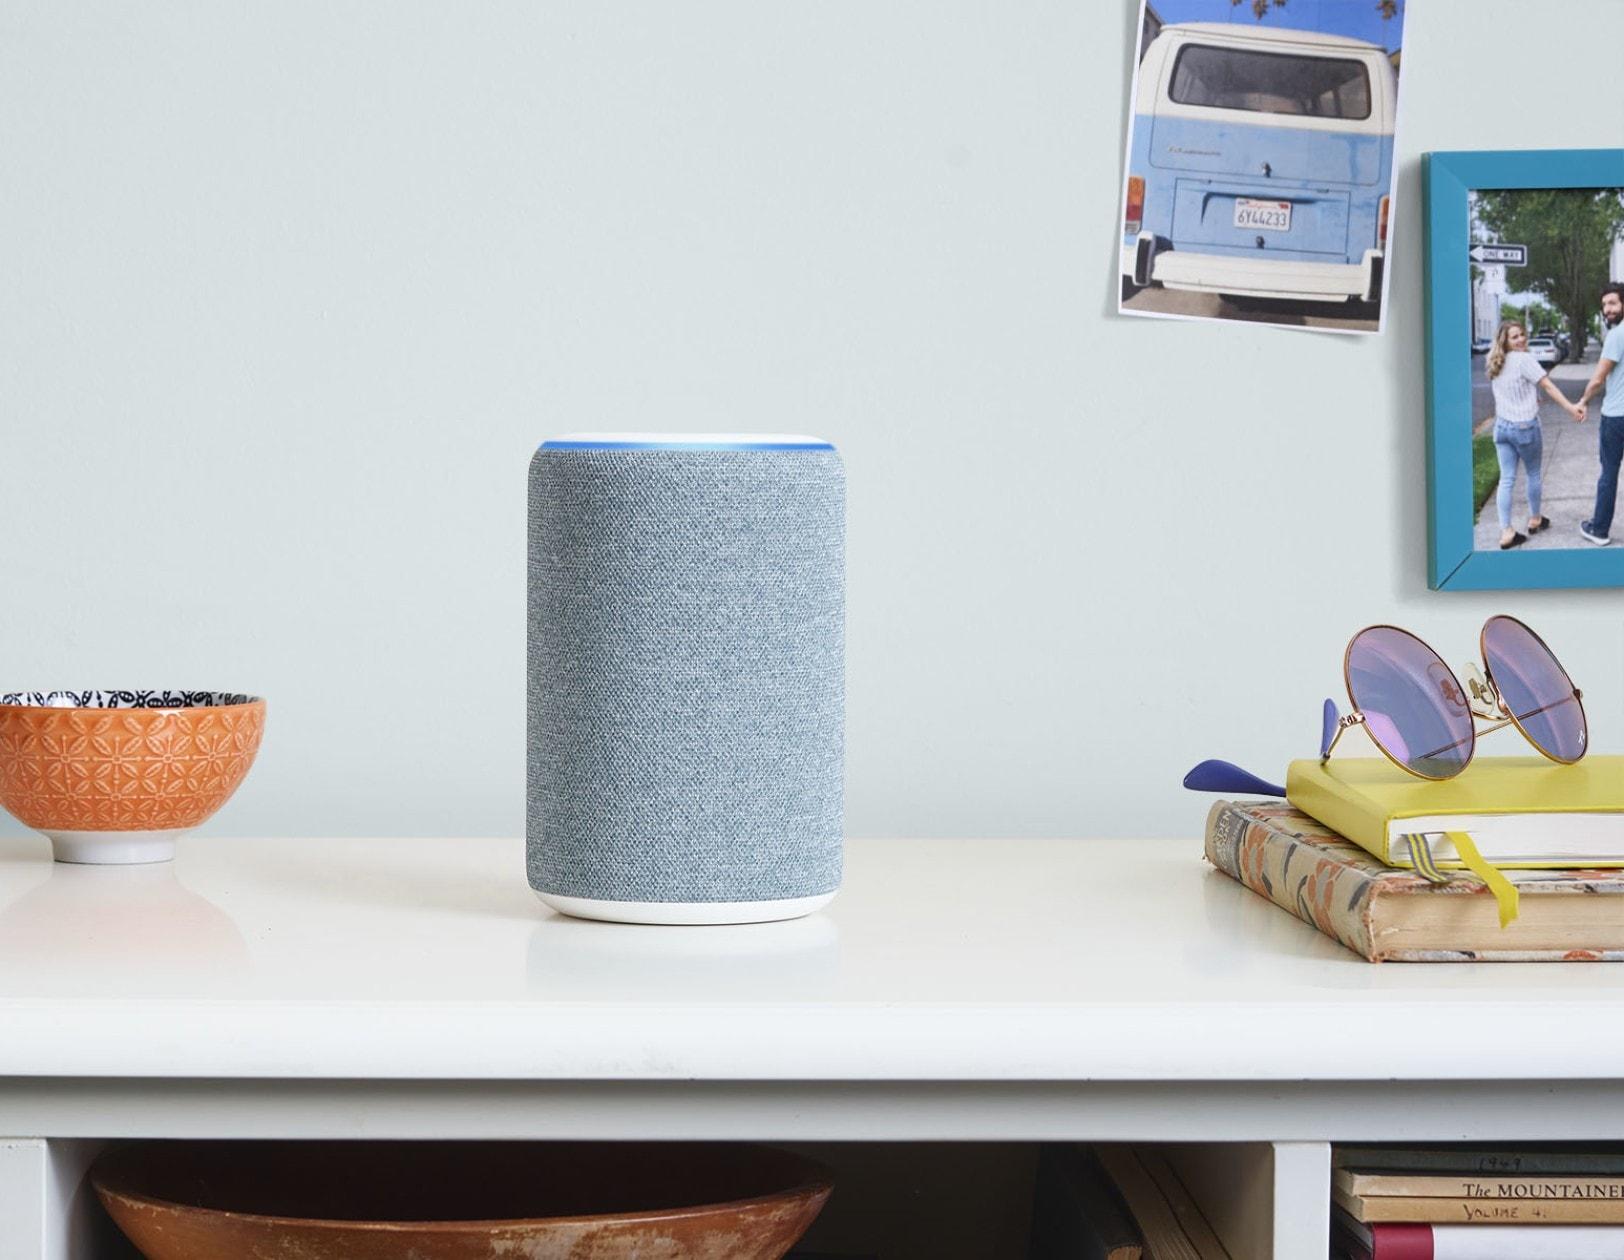 Now Amazon's Echo smart speaker comes in blue